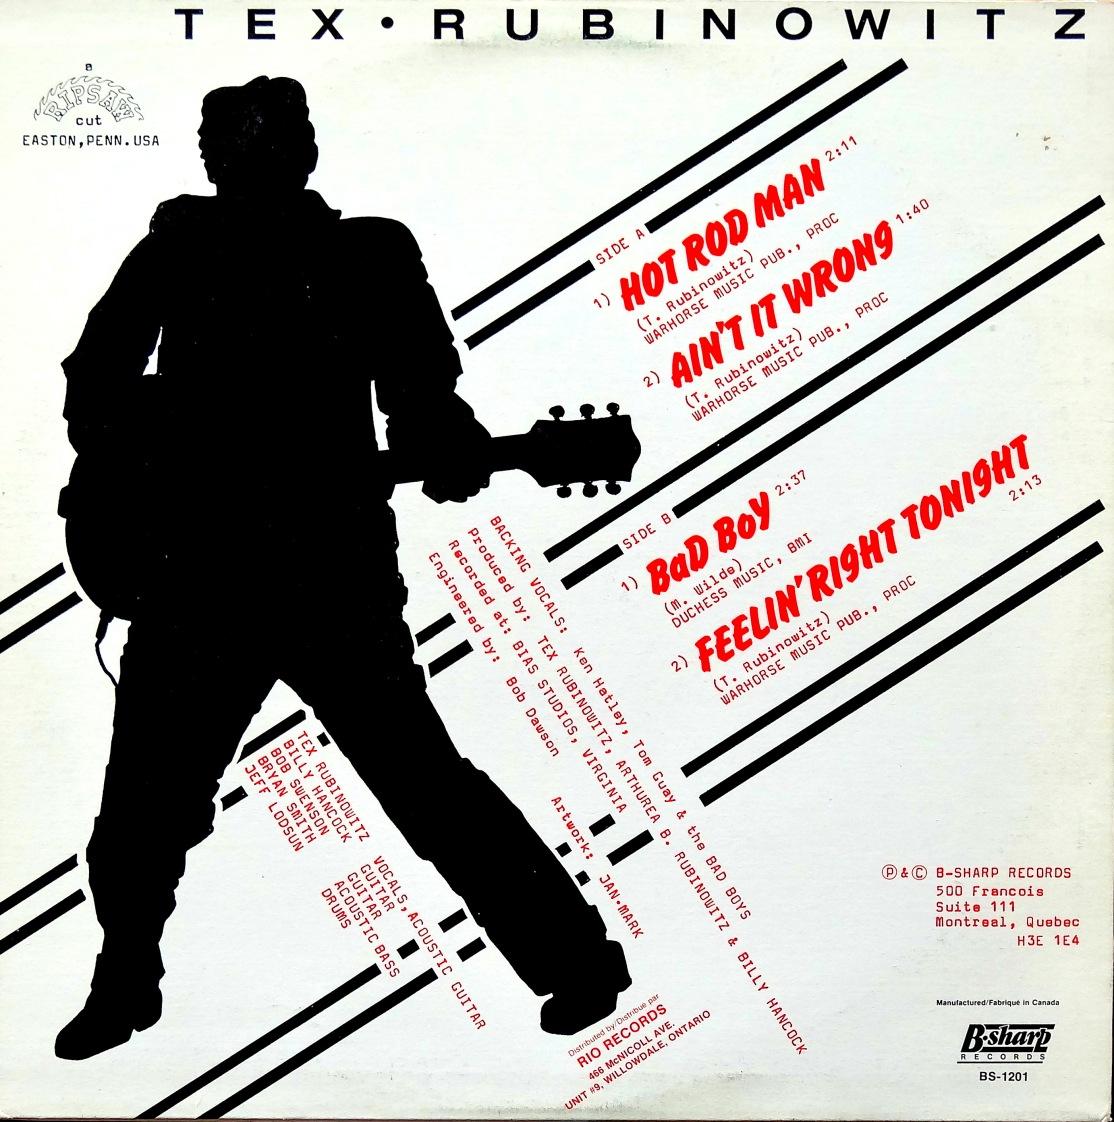 tex-rubinowitz-hot-rod-man-back